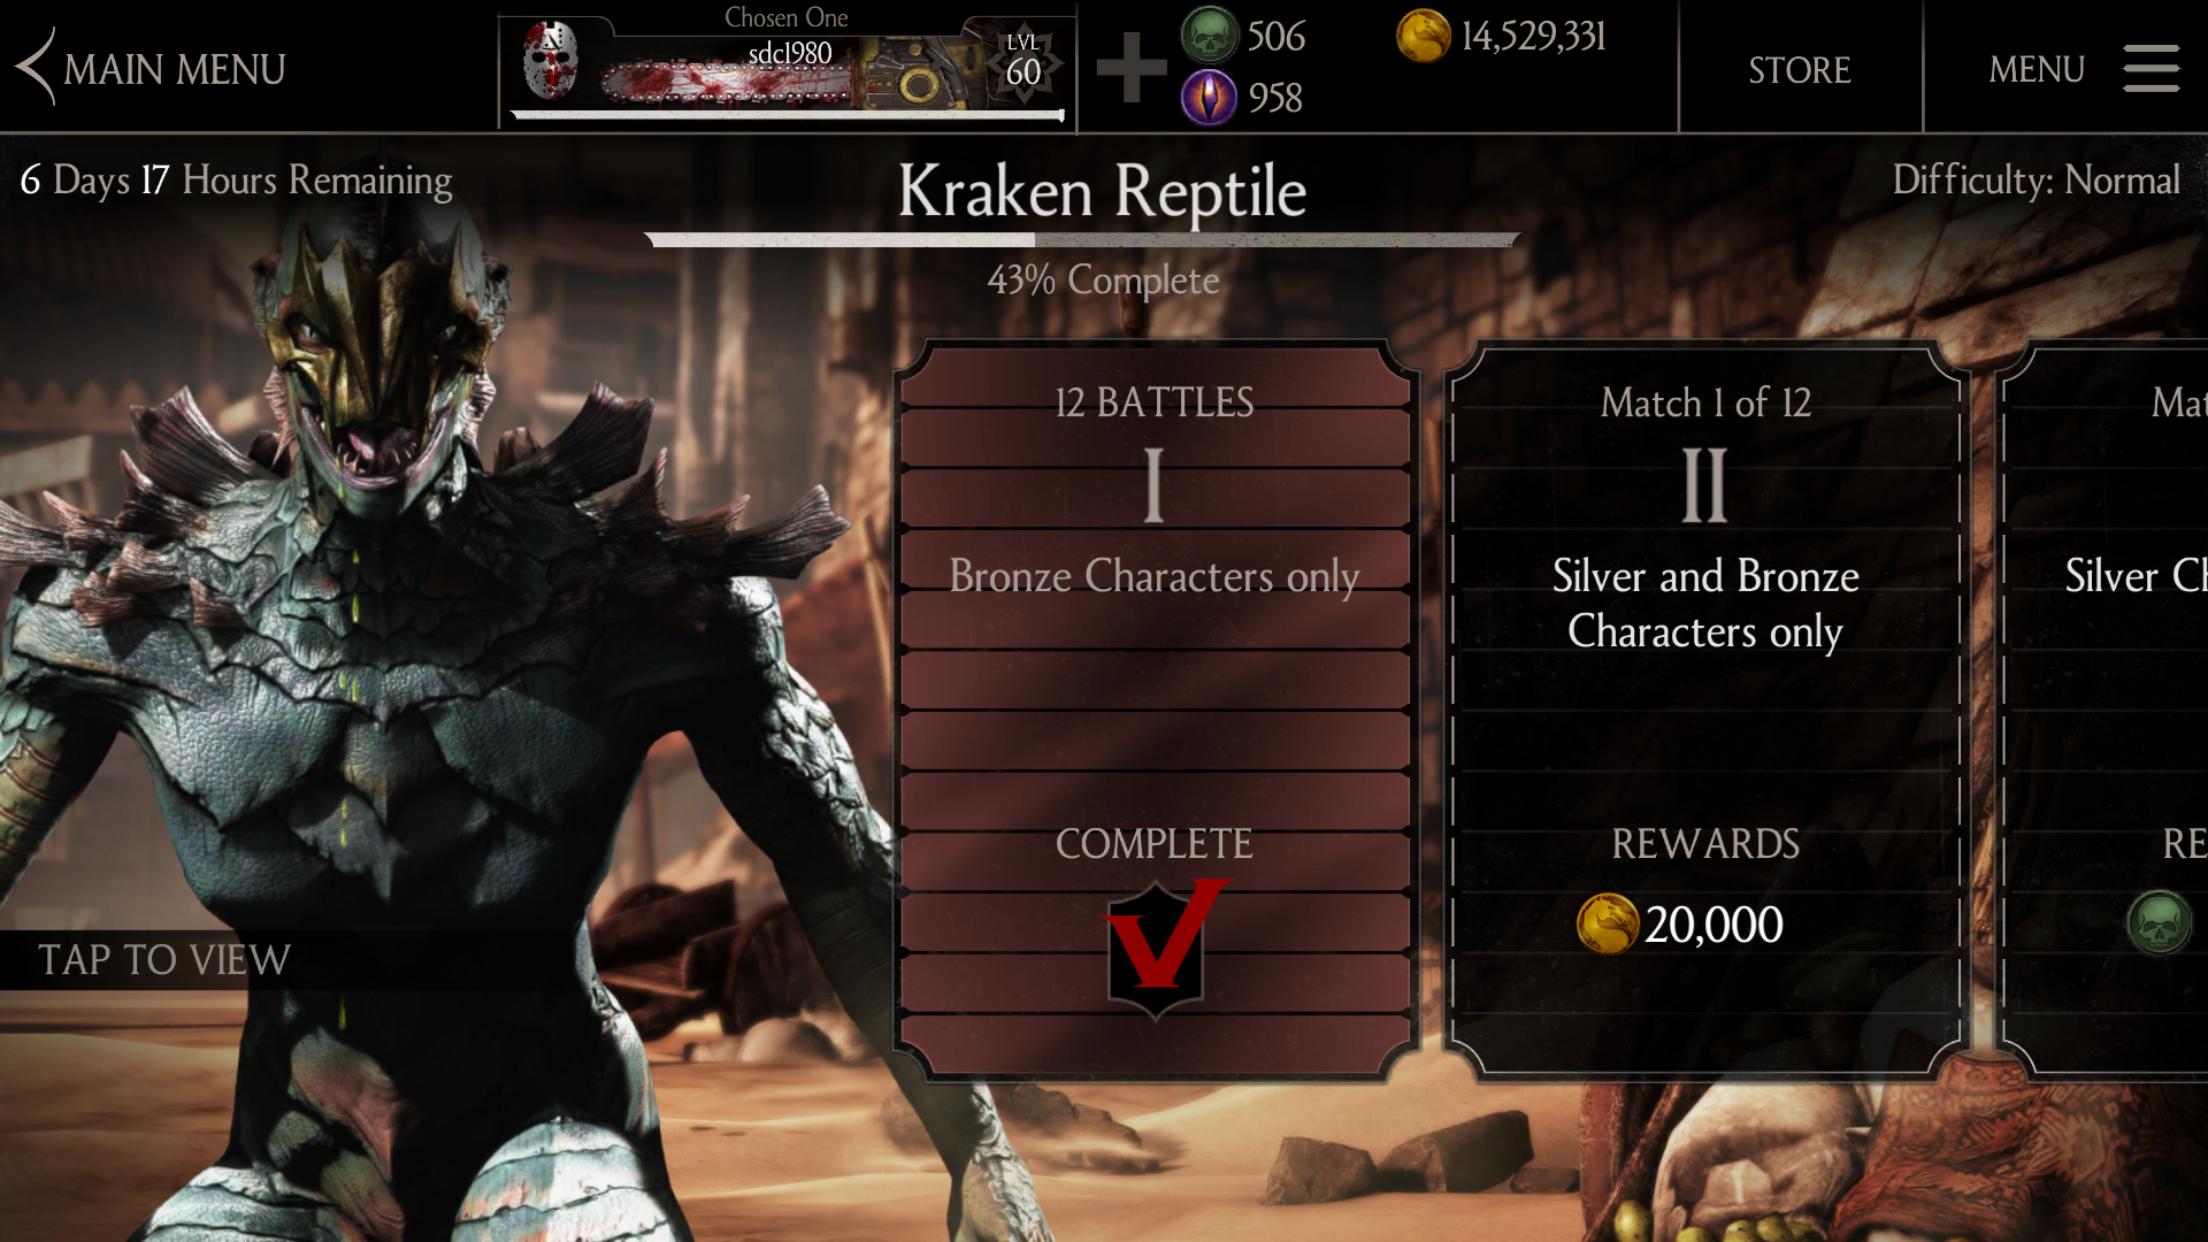 Mortal Kombat X mobile Challenge (12/13/18): Kraken Reptile